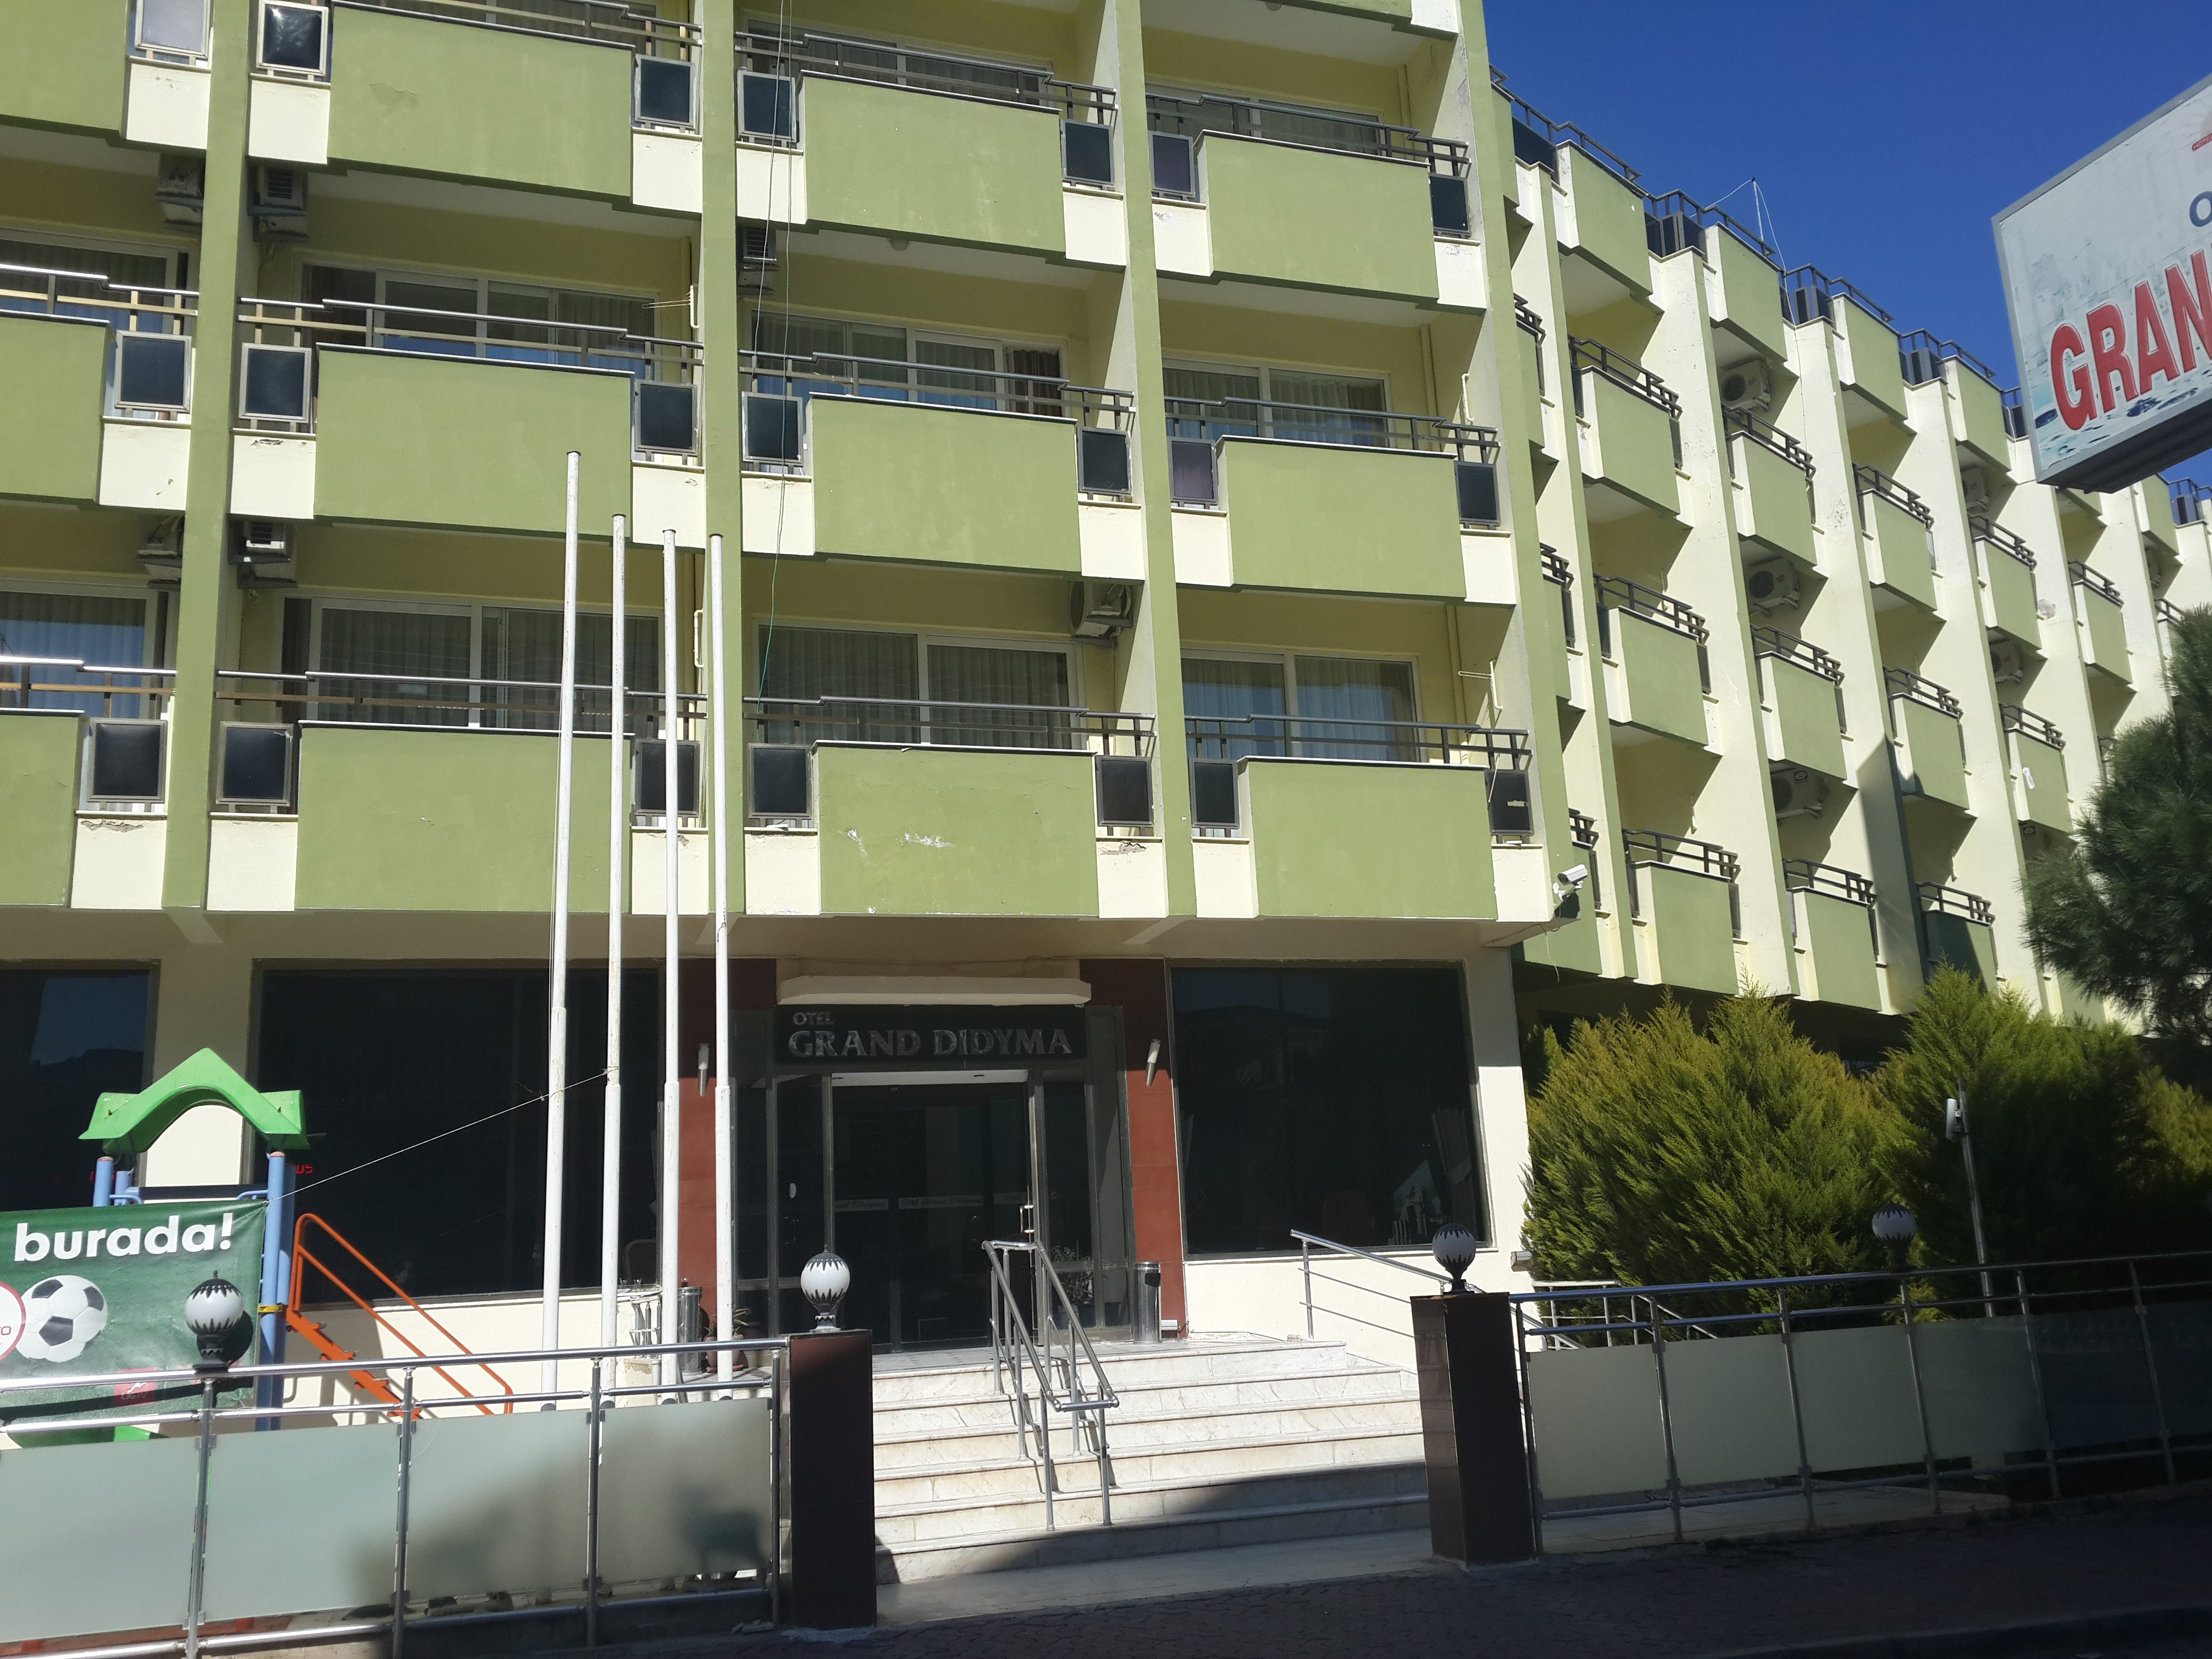 Grand Didyma Hotel59335